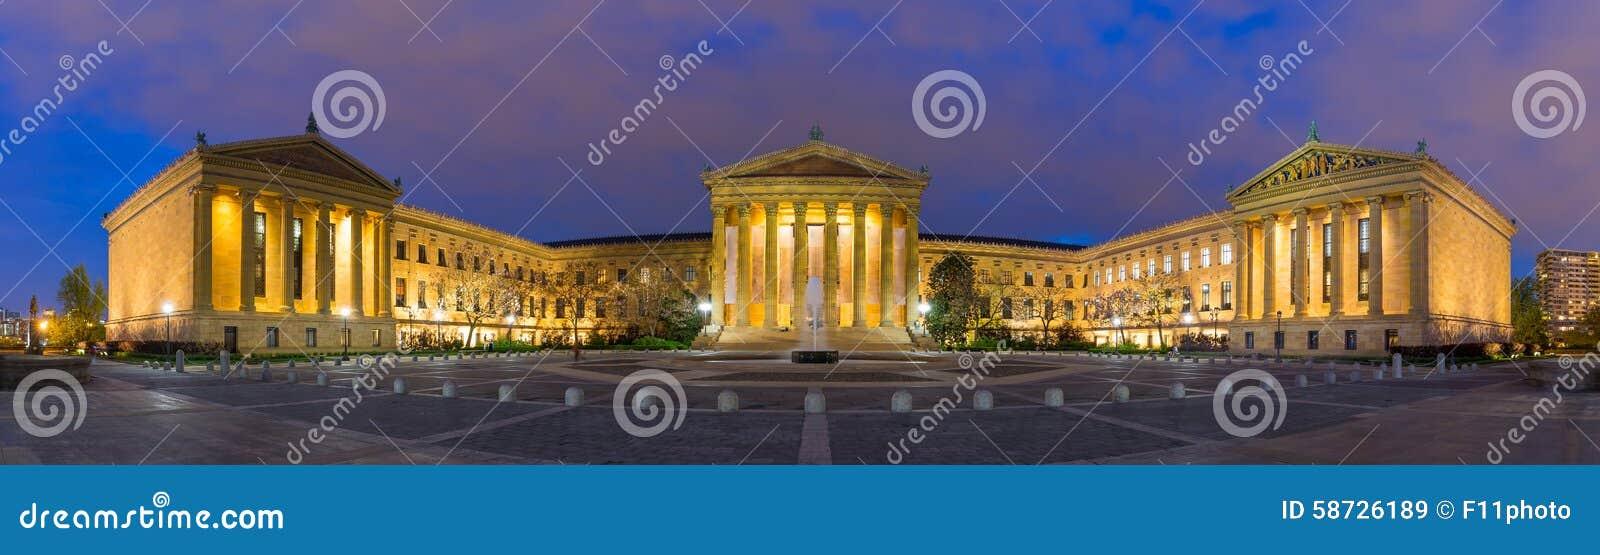 Panorama Filadelfia Pennsylwania muzeum sztuki